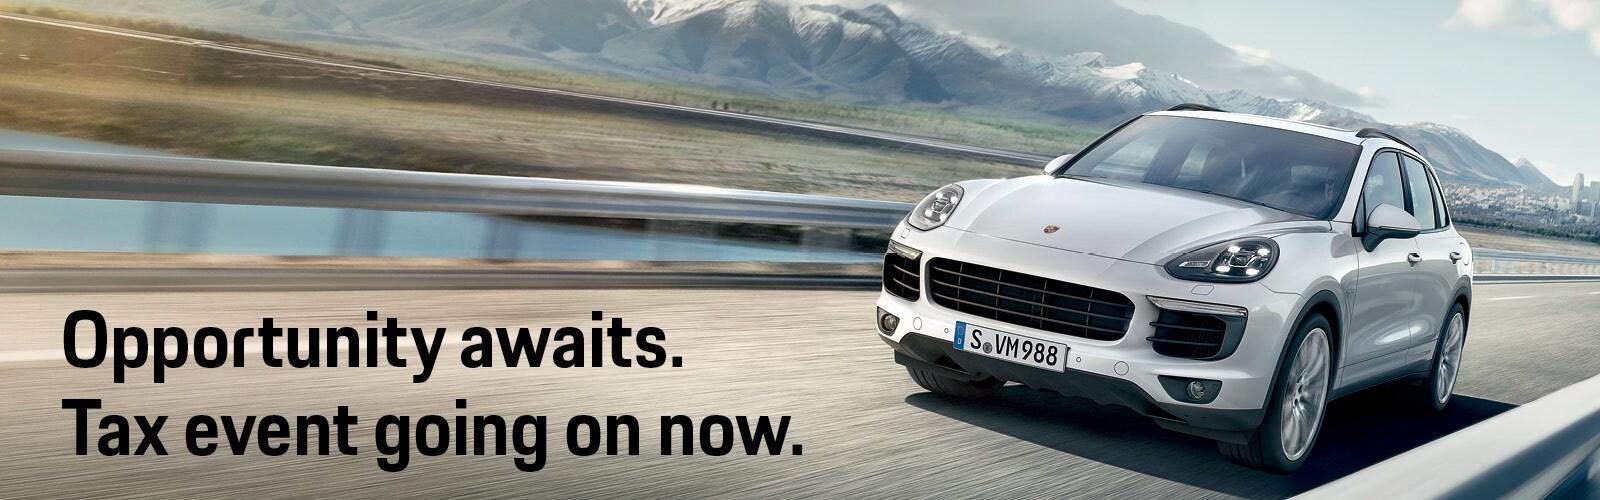 Paul Miller Porsche New Porsche Dealership In Parsippany Nj 07054